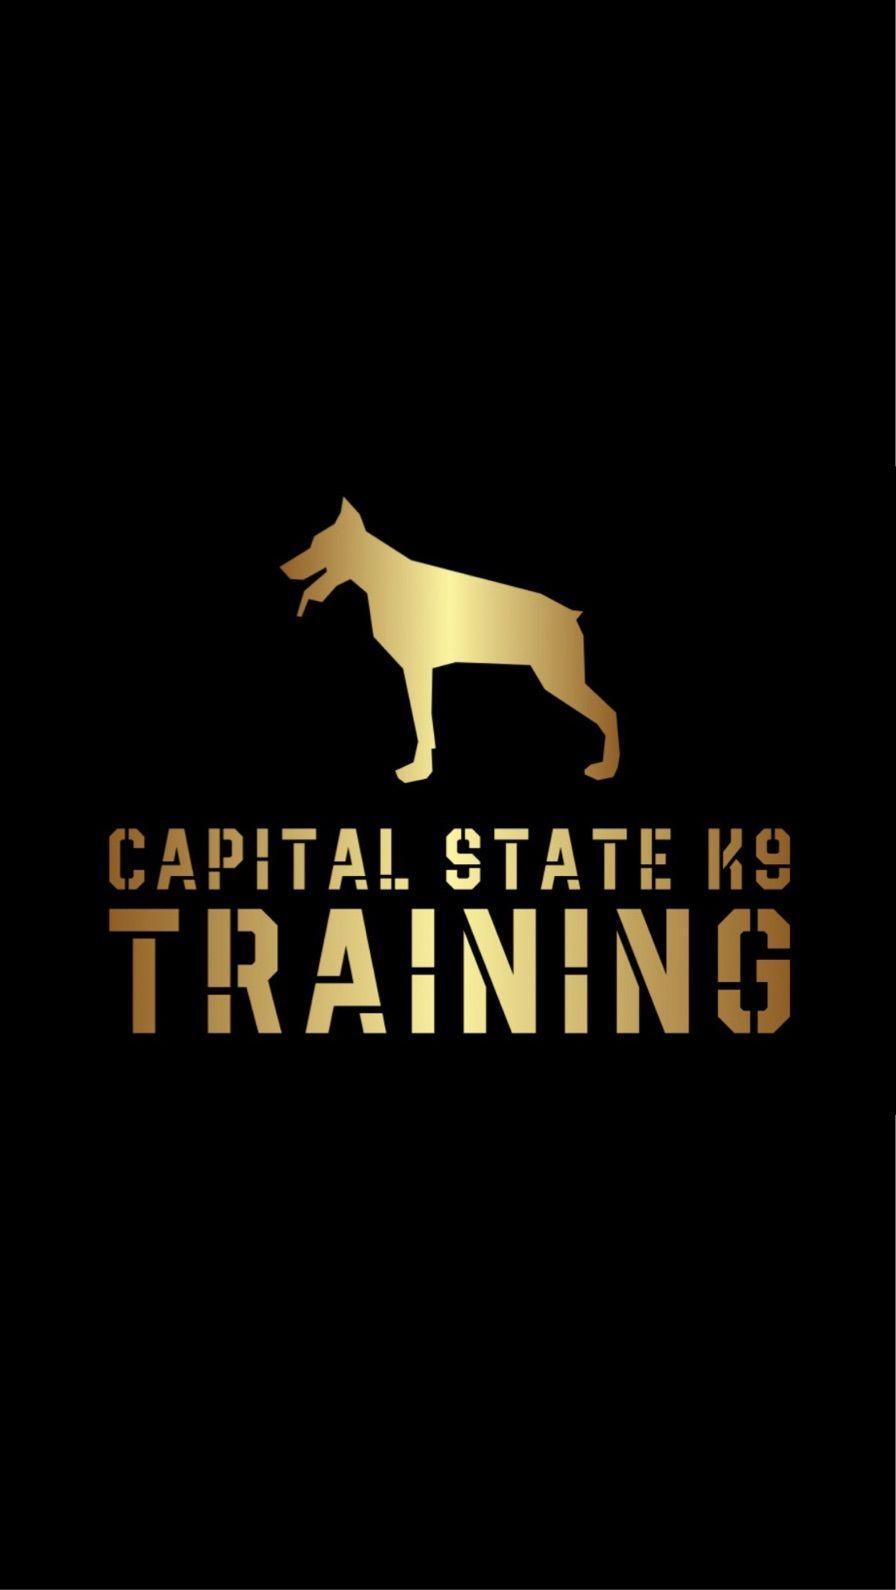 Capital State K9 Training